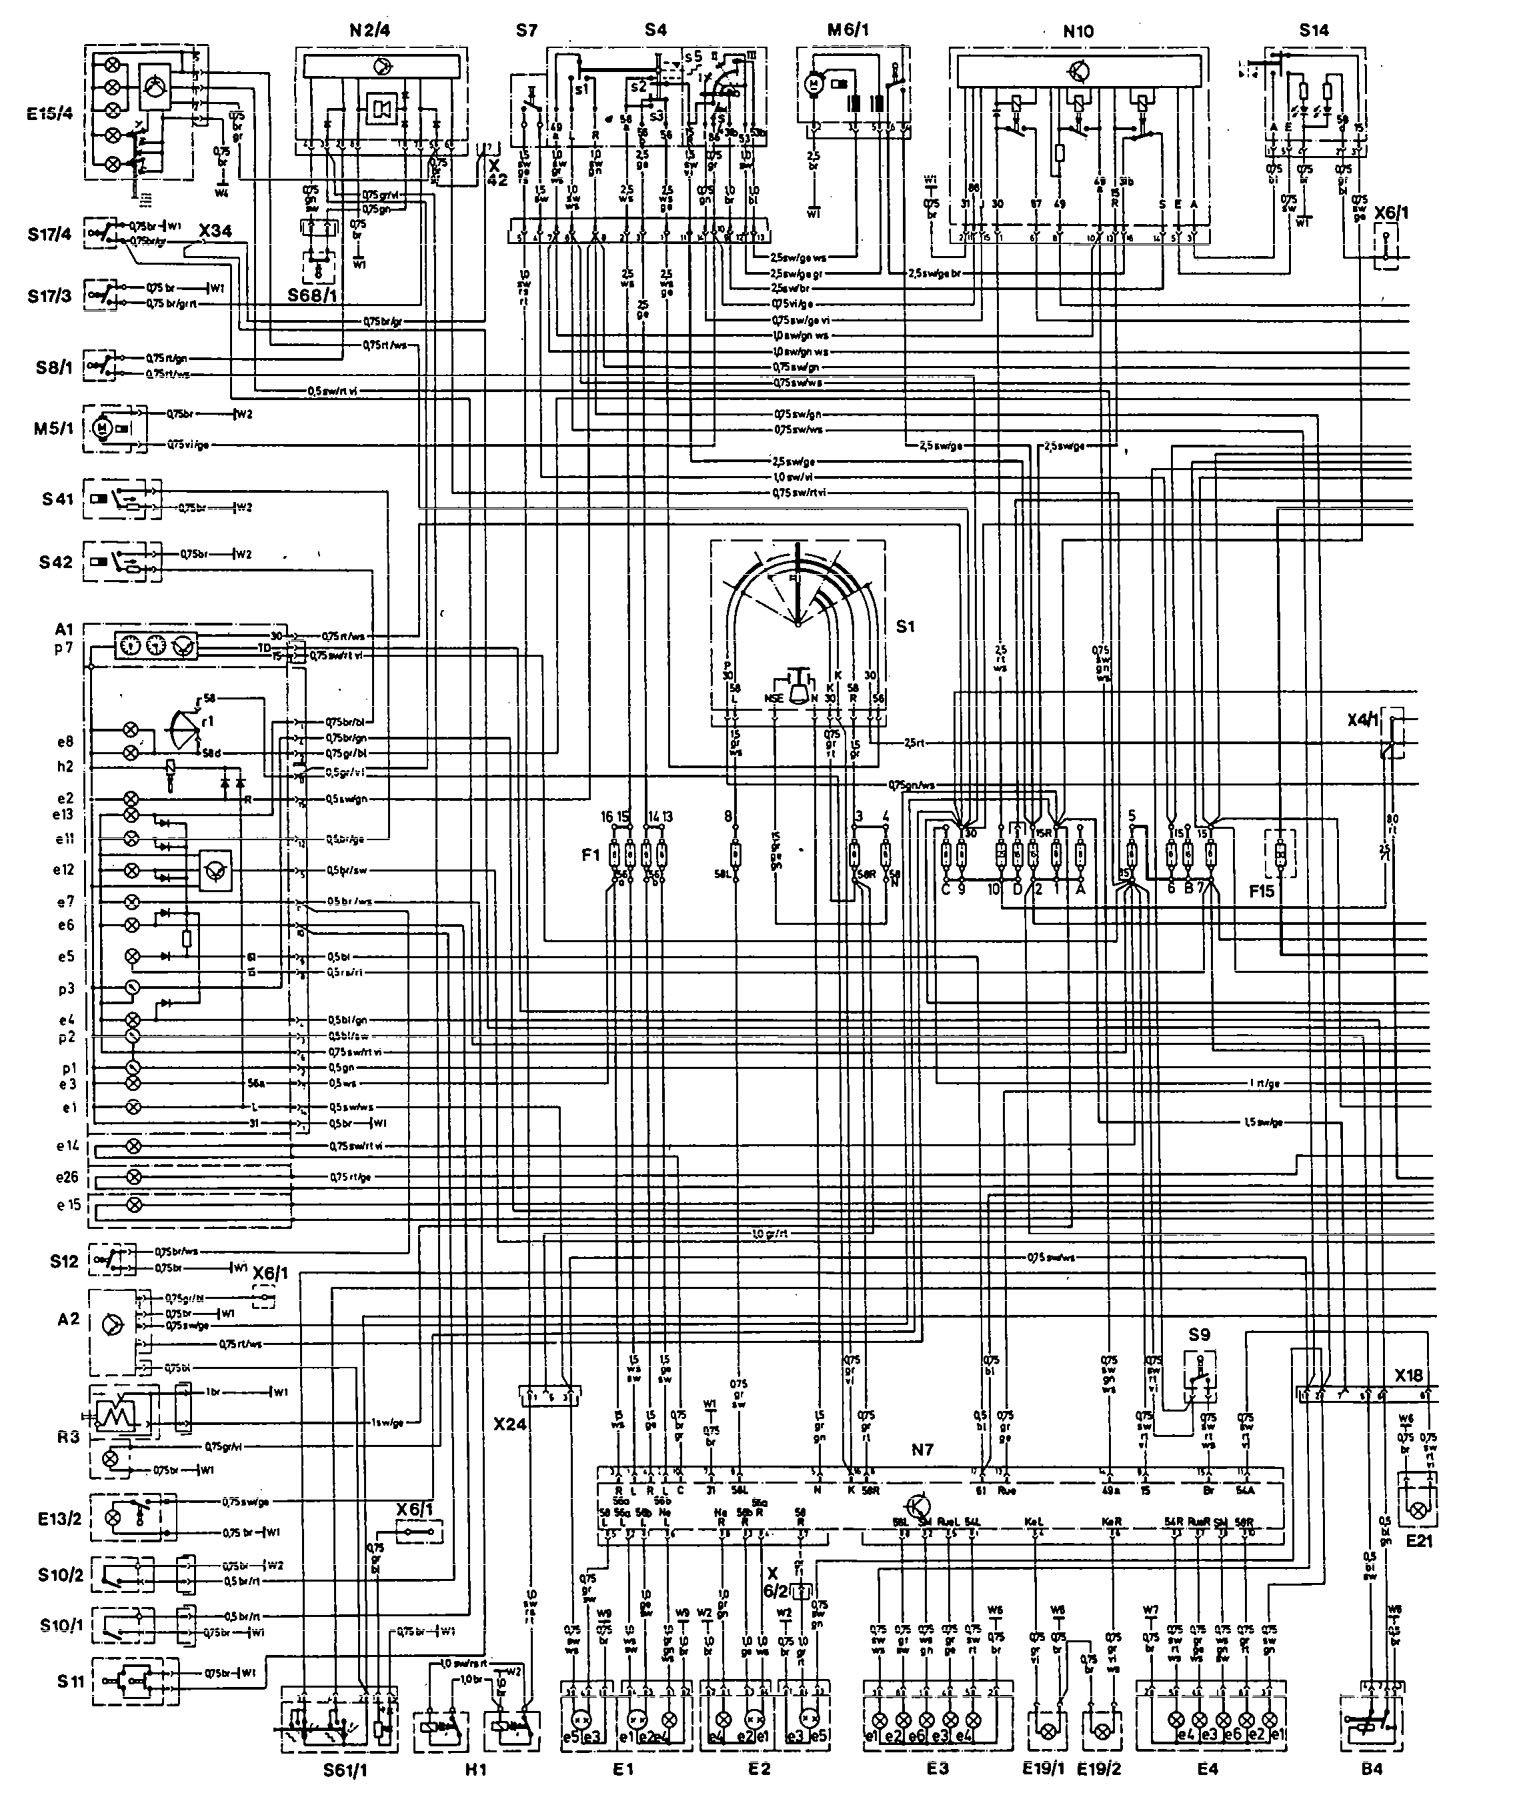 1993 Mercedes 300e Engine Diagram Electrical Wiring Diagrams Radio Benz 500e 1992 Fuel Controls 93